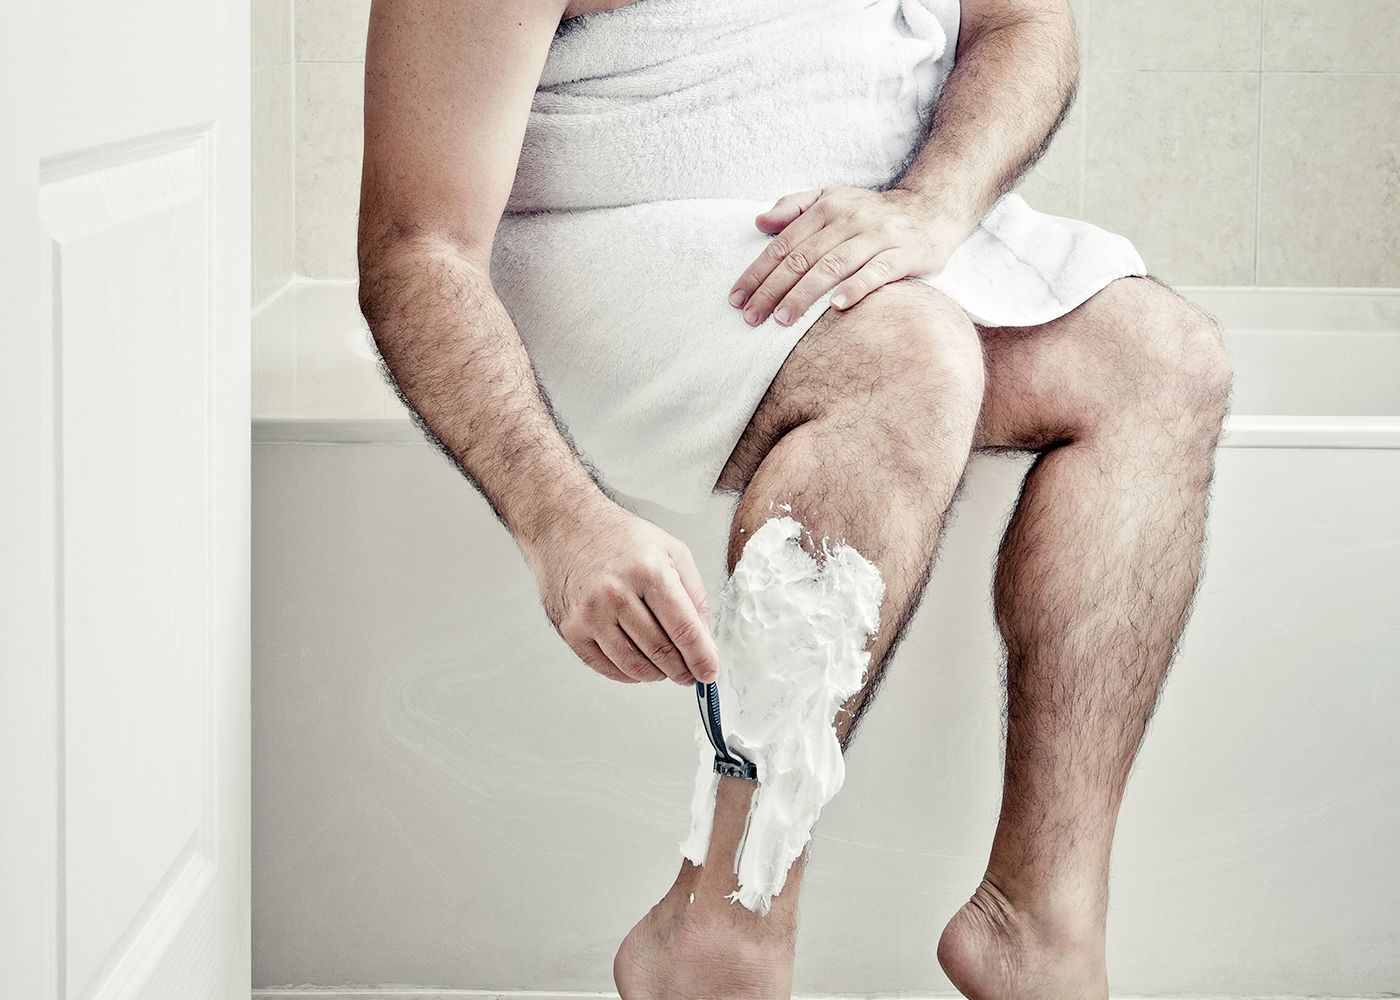 His leg shave